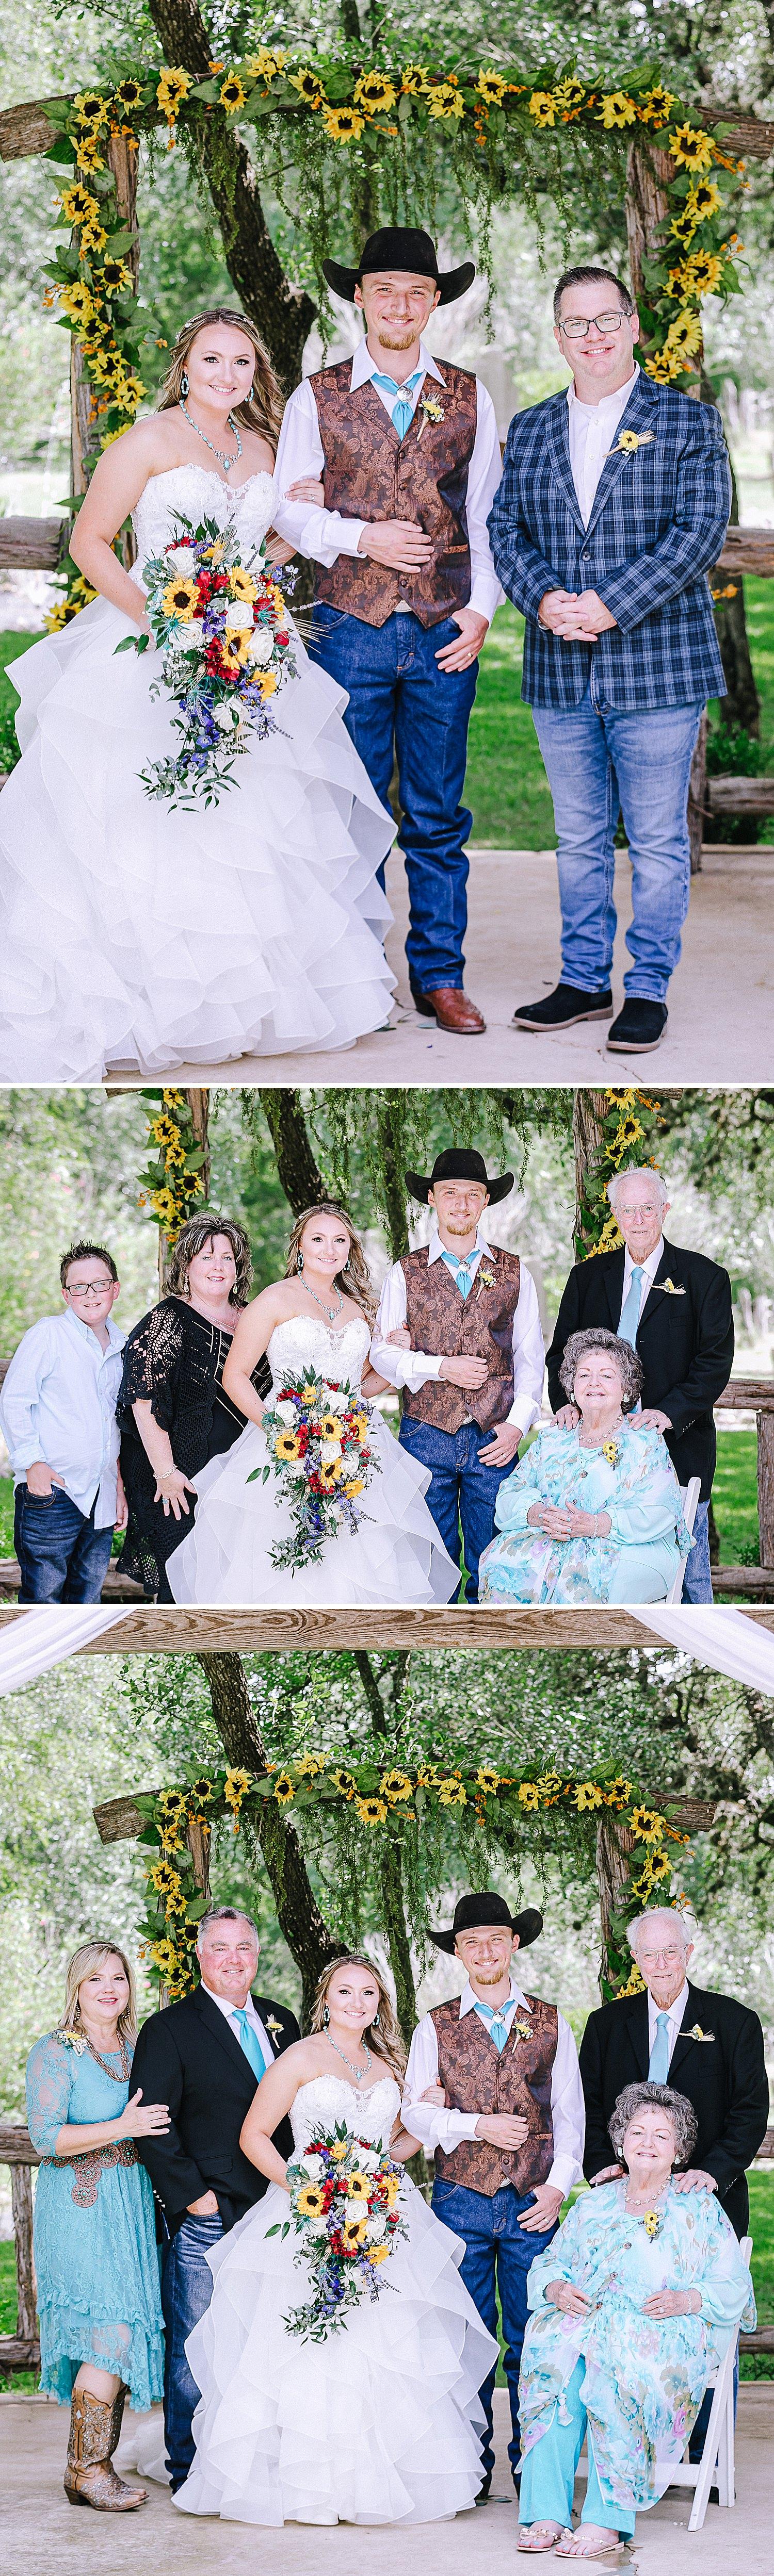 Carly-Barton-Photography-Old-Town-Texas-Rustic-Wedding-Photos-Sunflowers-Boots-Kyle-Texas_0048.jpg